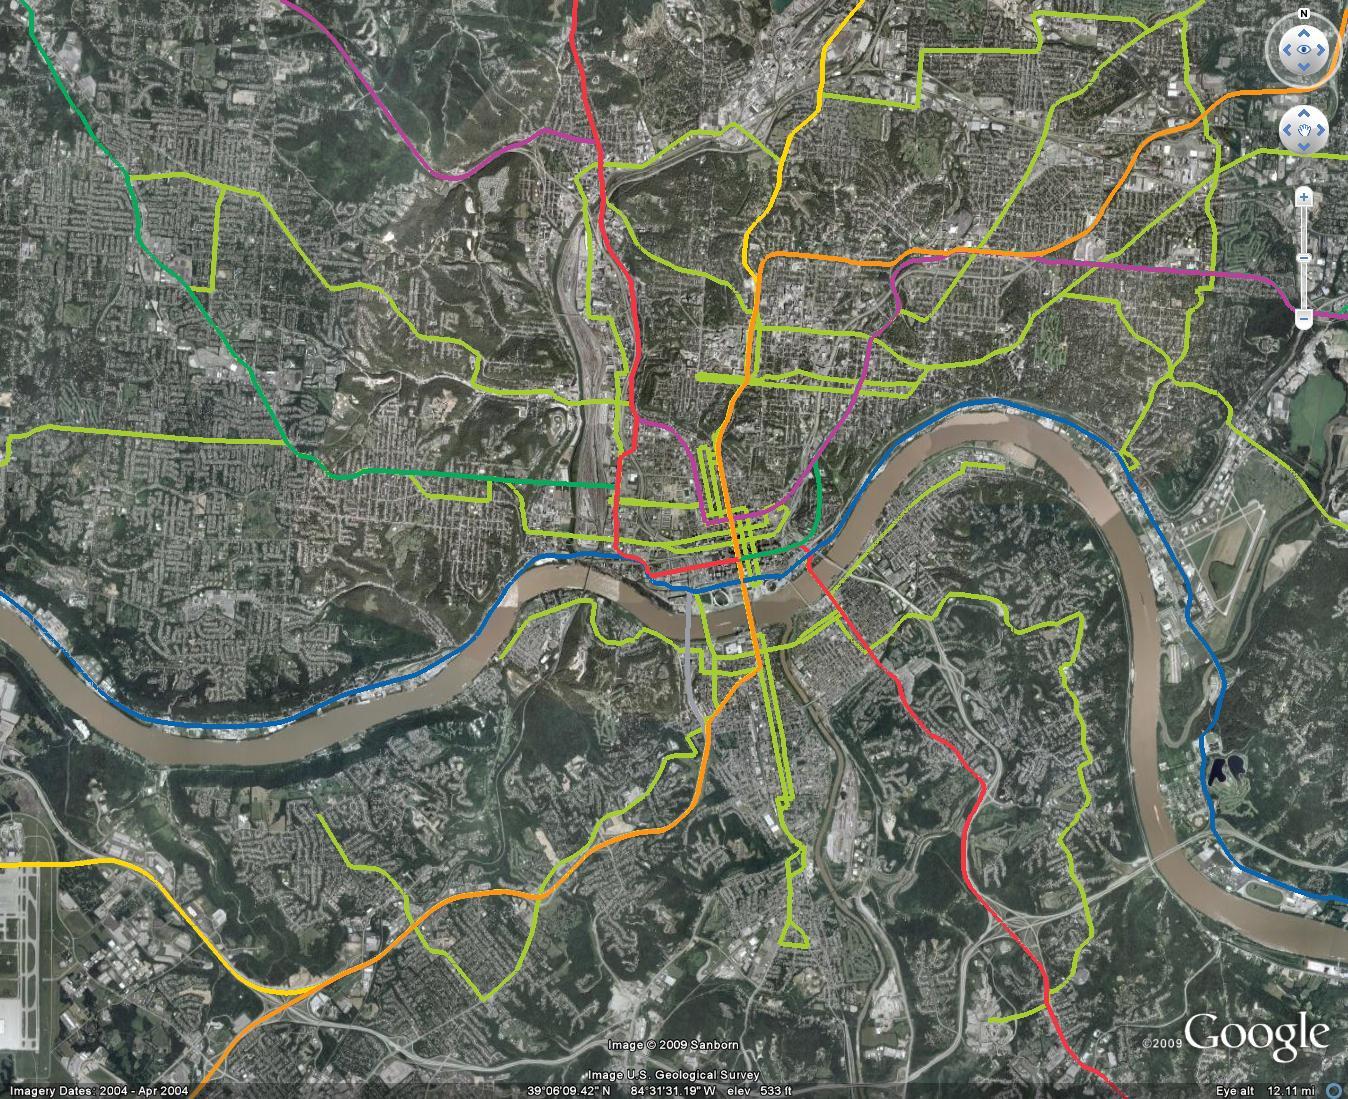 Metro Cincinnati  Routes And Maps - Nyc subway map google earth